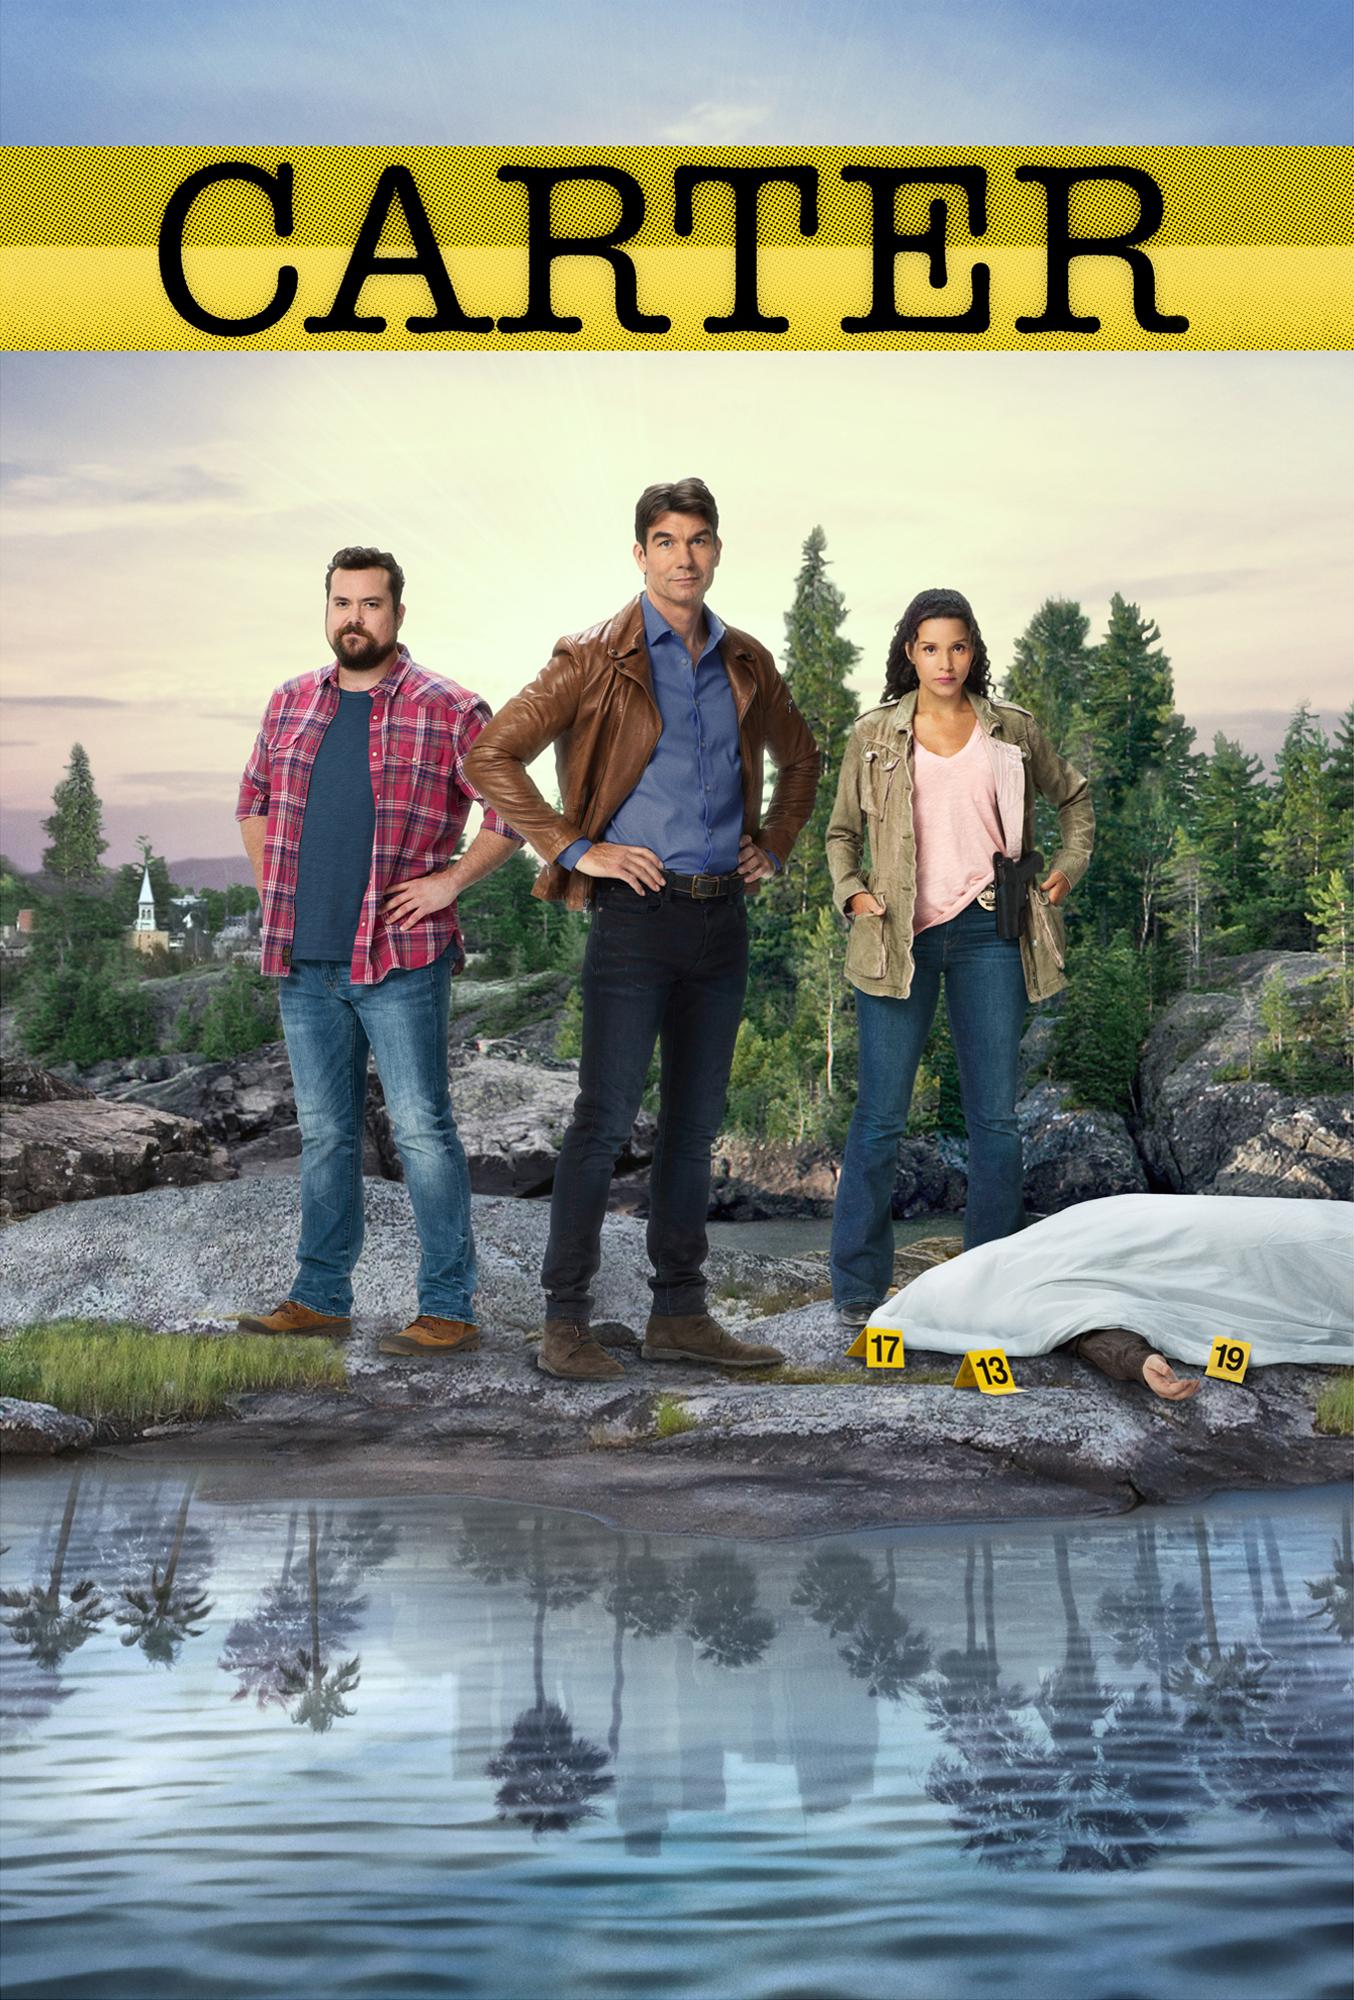 Detektyvas Karteris (1 Sezonas) / Carter Season 1